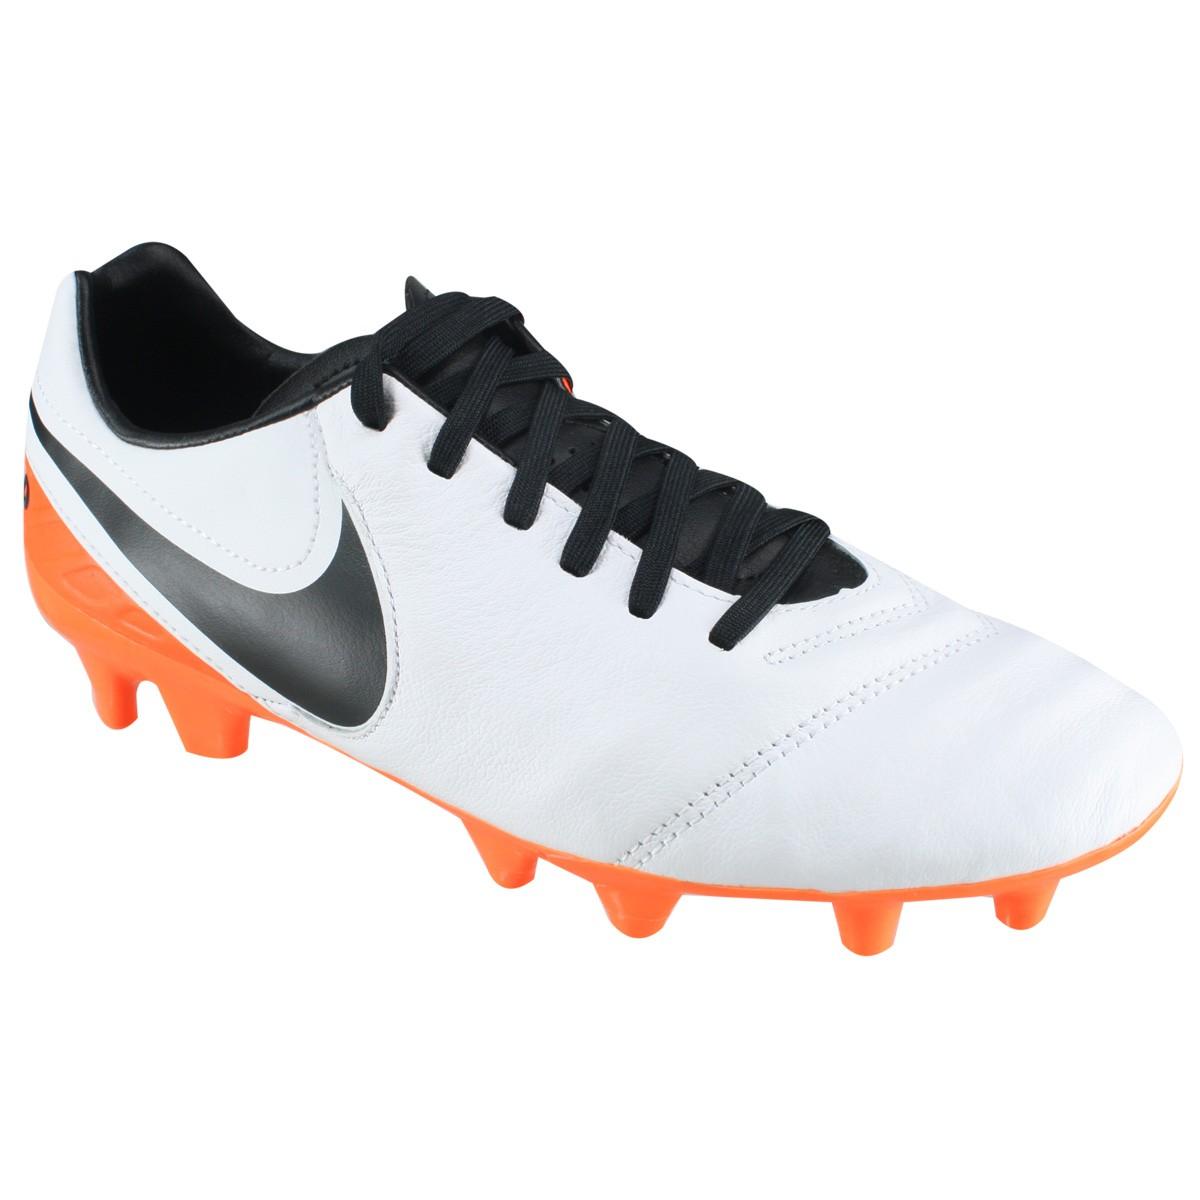 d84b8823b6 Chuteira Nike Campo Tiempo Mystic V FG 819236-108 - Branco Laranja ...